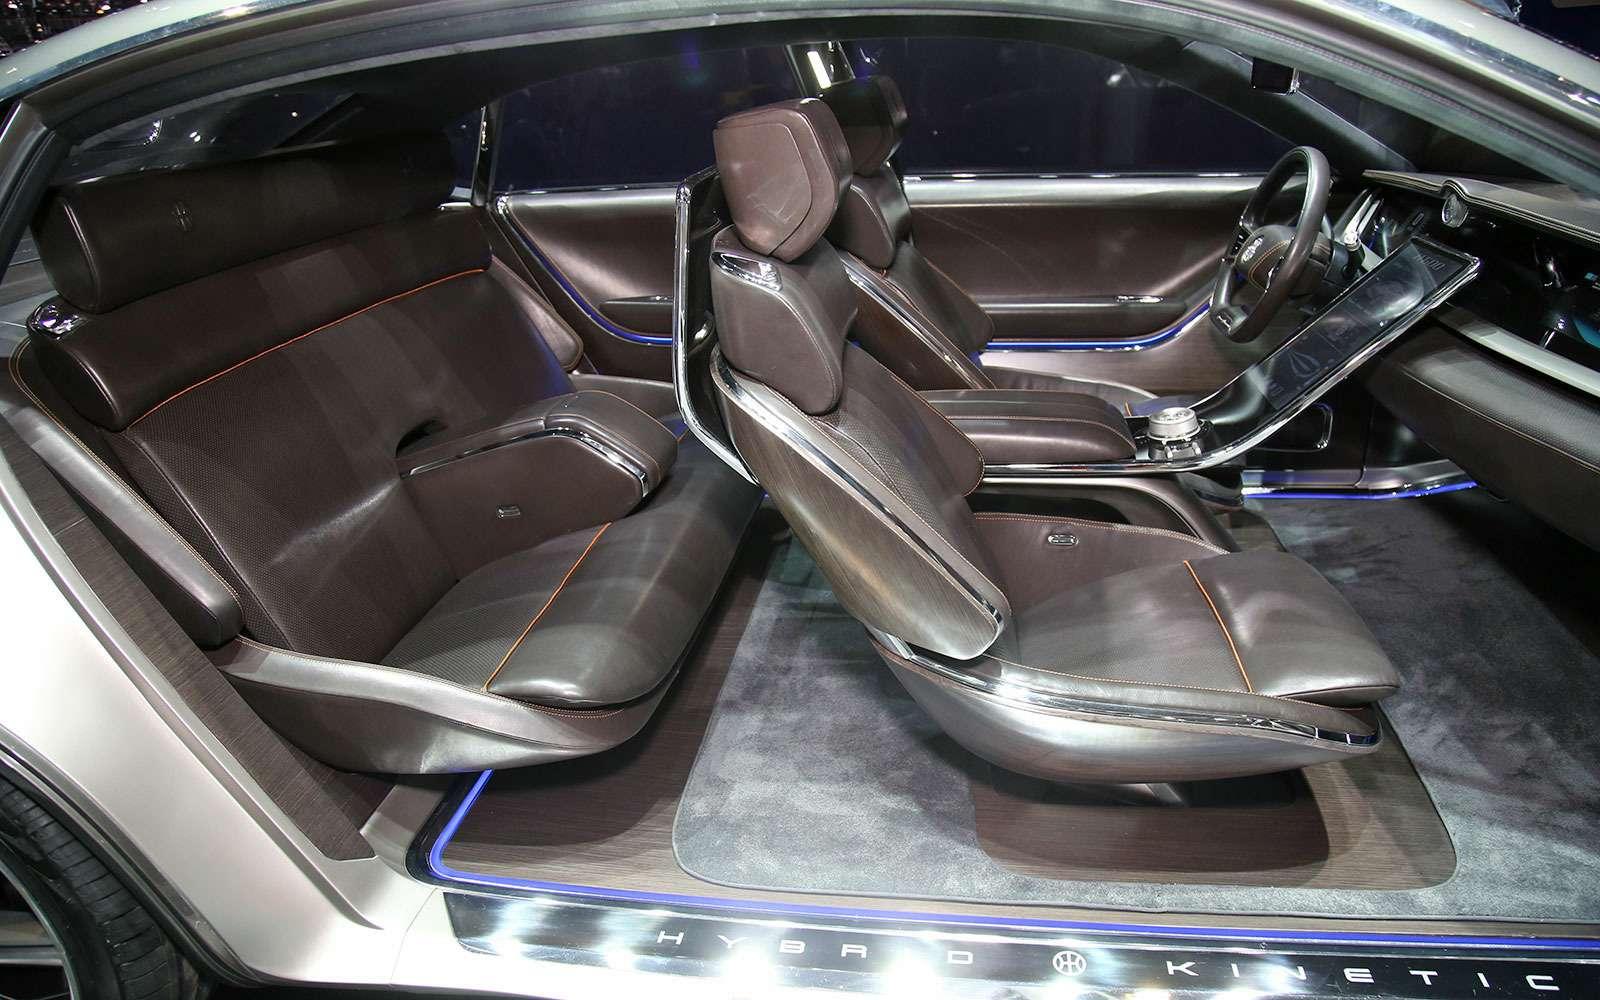 Pininfarina H600 Concept